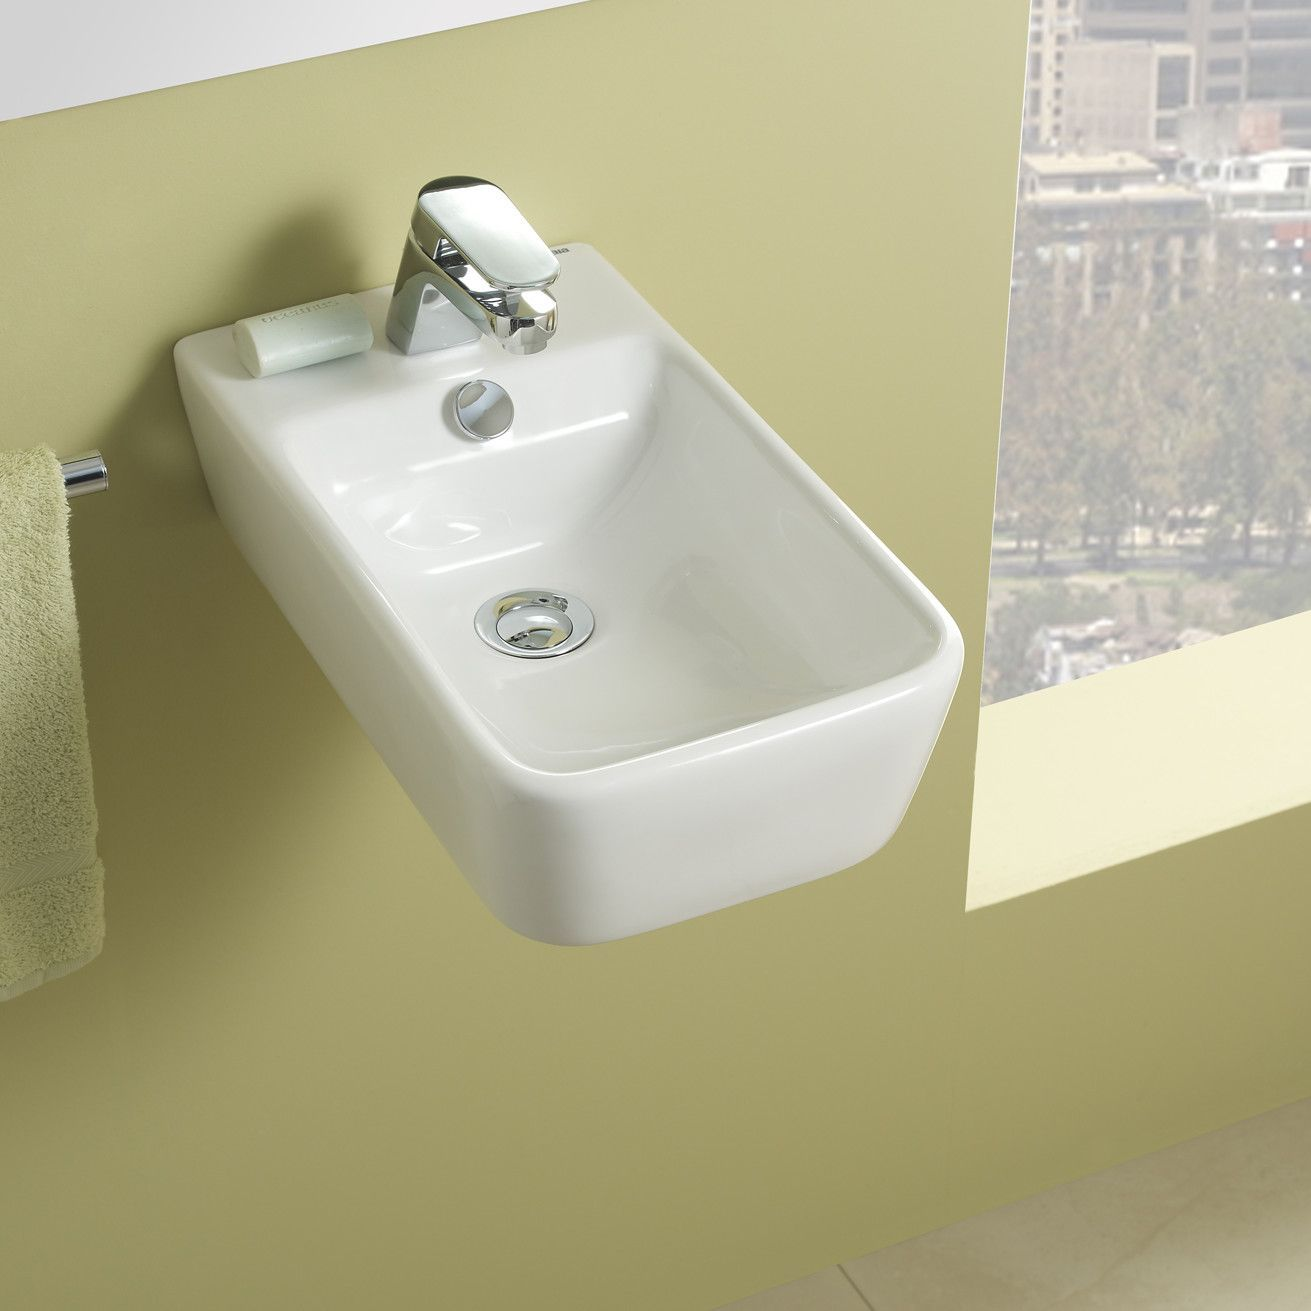 Bissonnet Emma Small Ceramic Bathroom Sink & Reviews  Wayfair New Wayfair Bathroom Sinks Inspiration